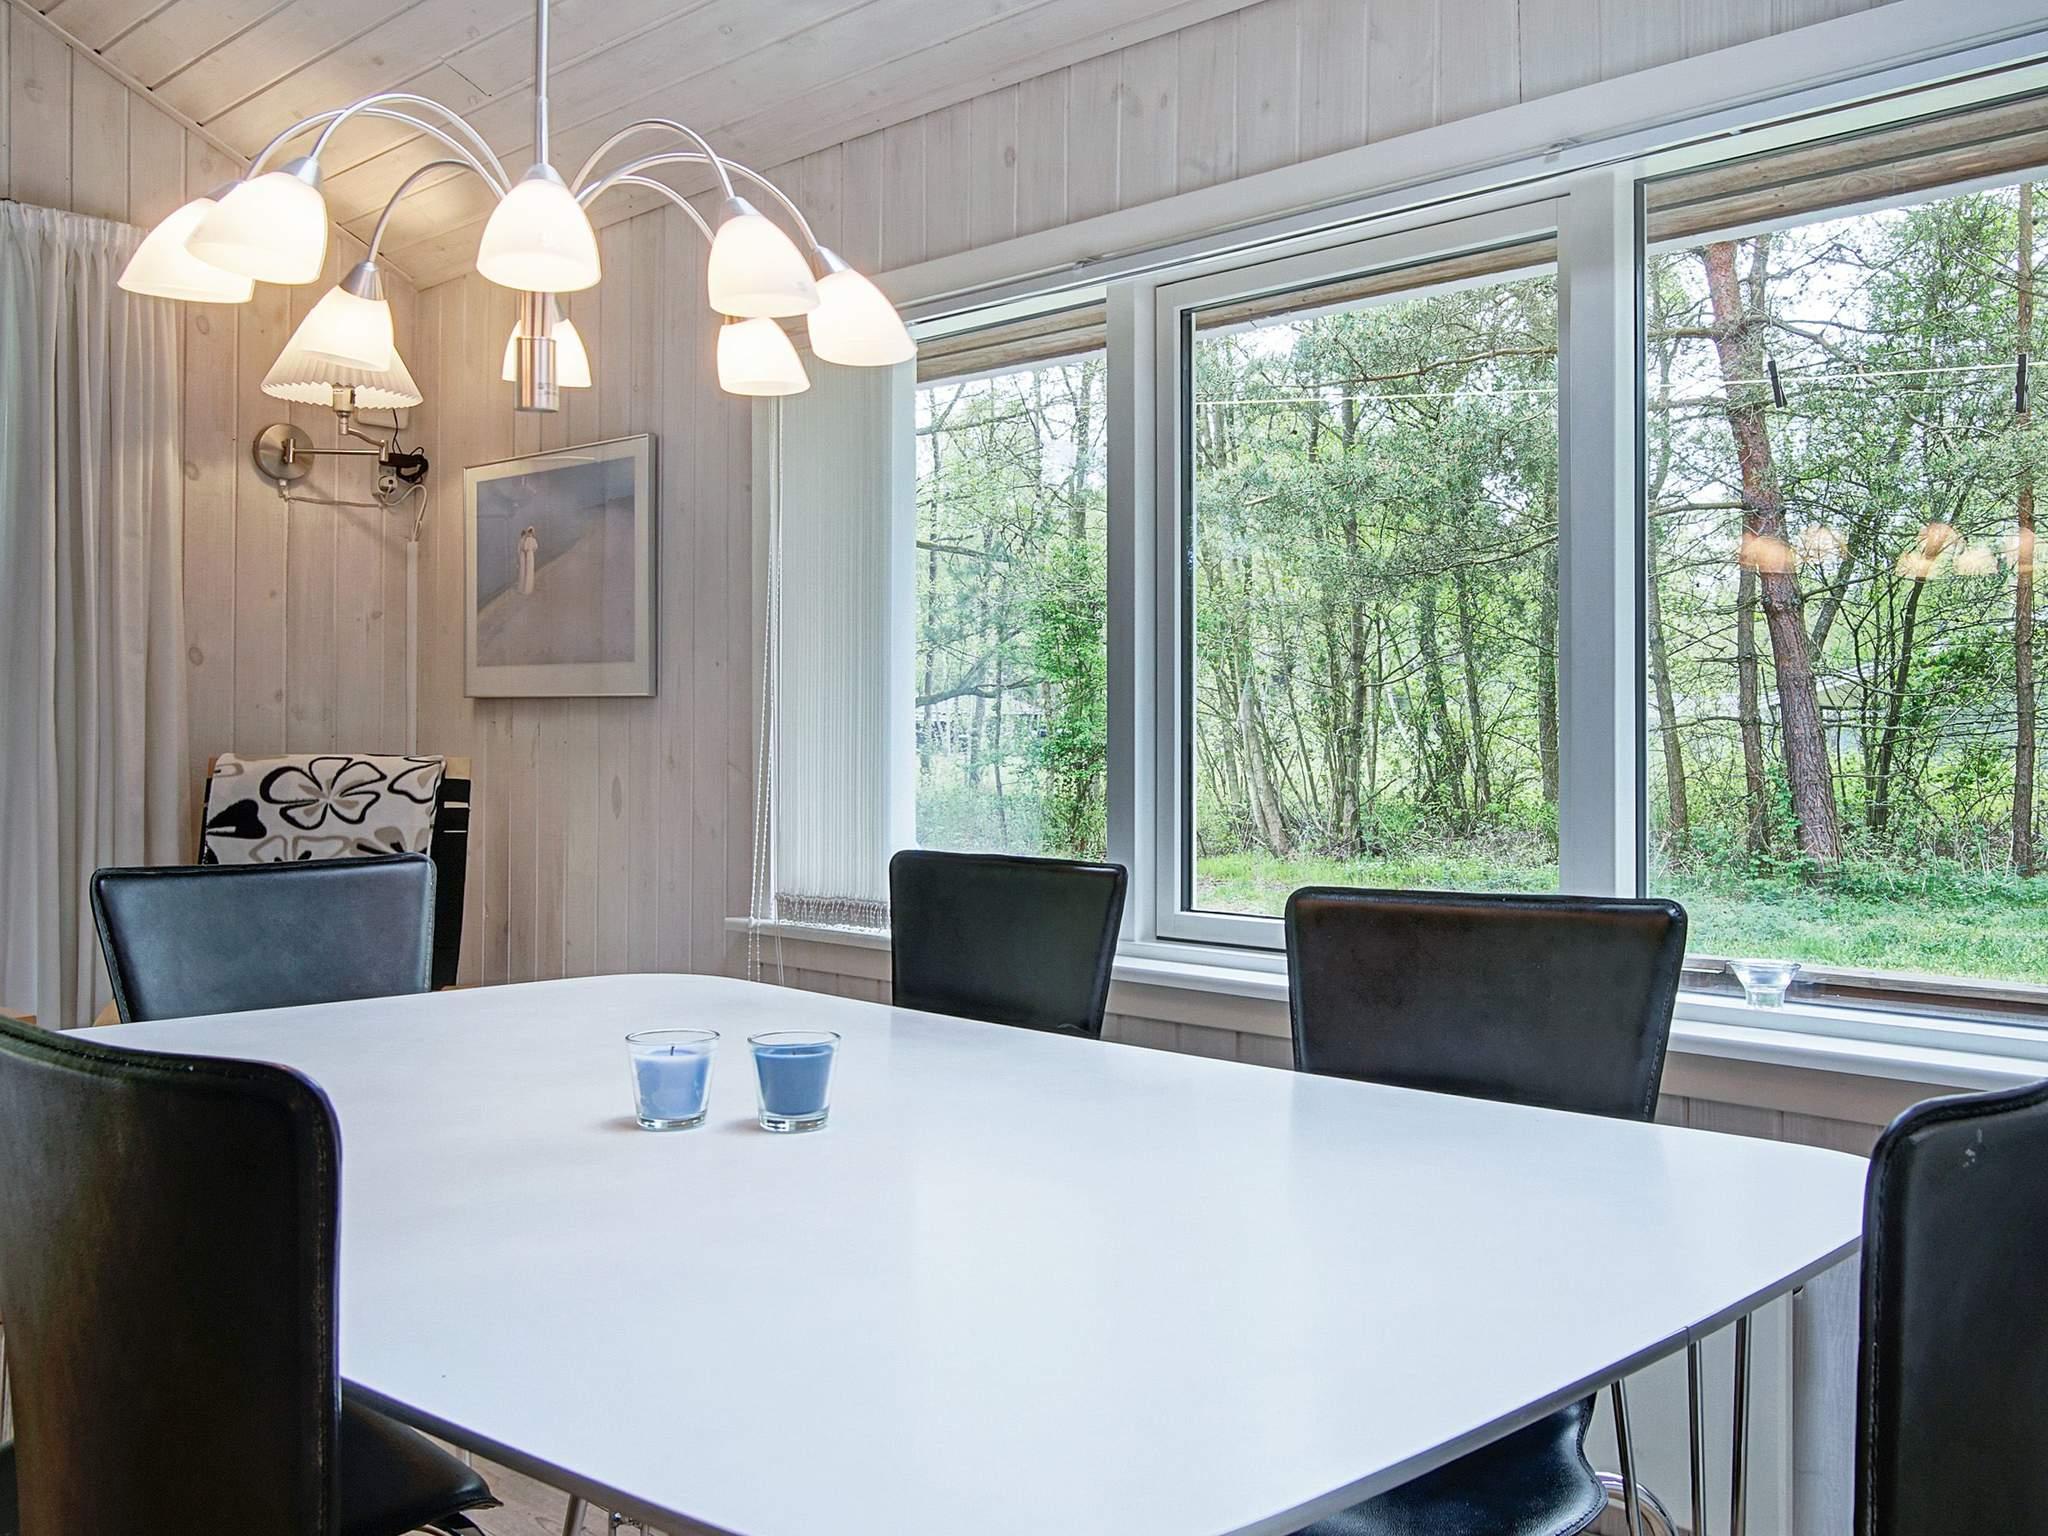 Ferienhaus Sommerodde (82550), Nexø, , Bornholm, Dänemark, Bild 3